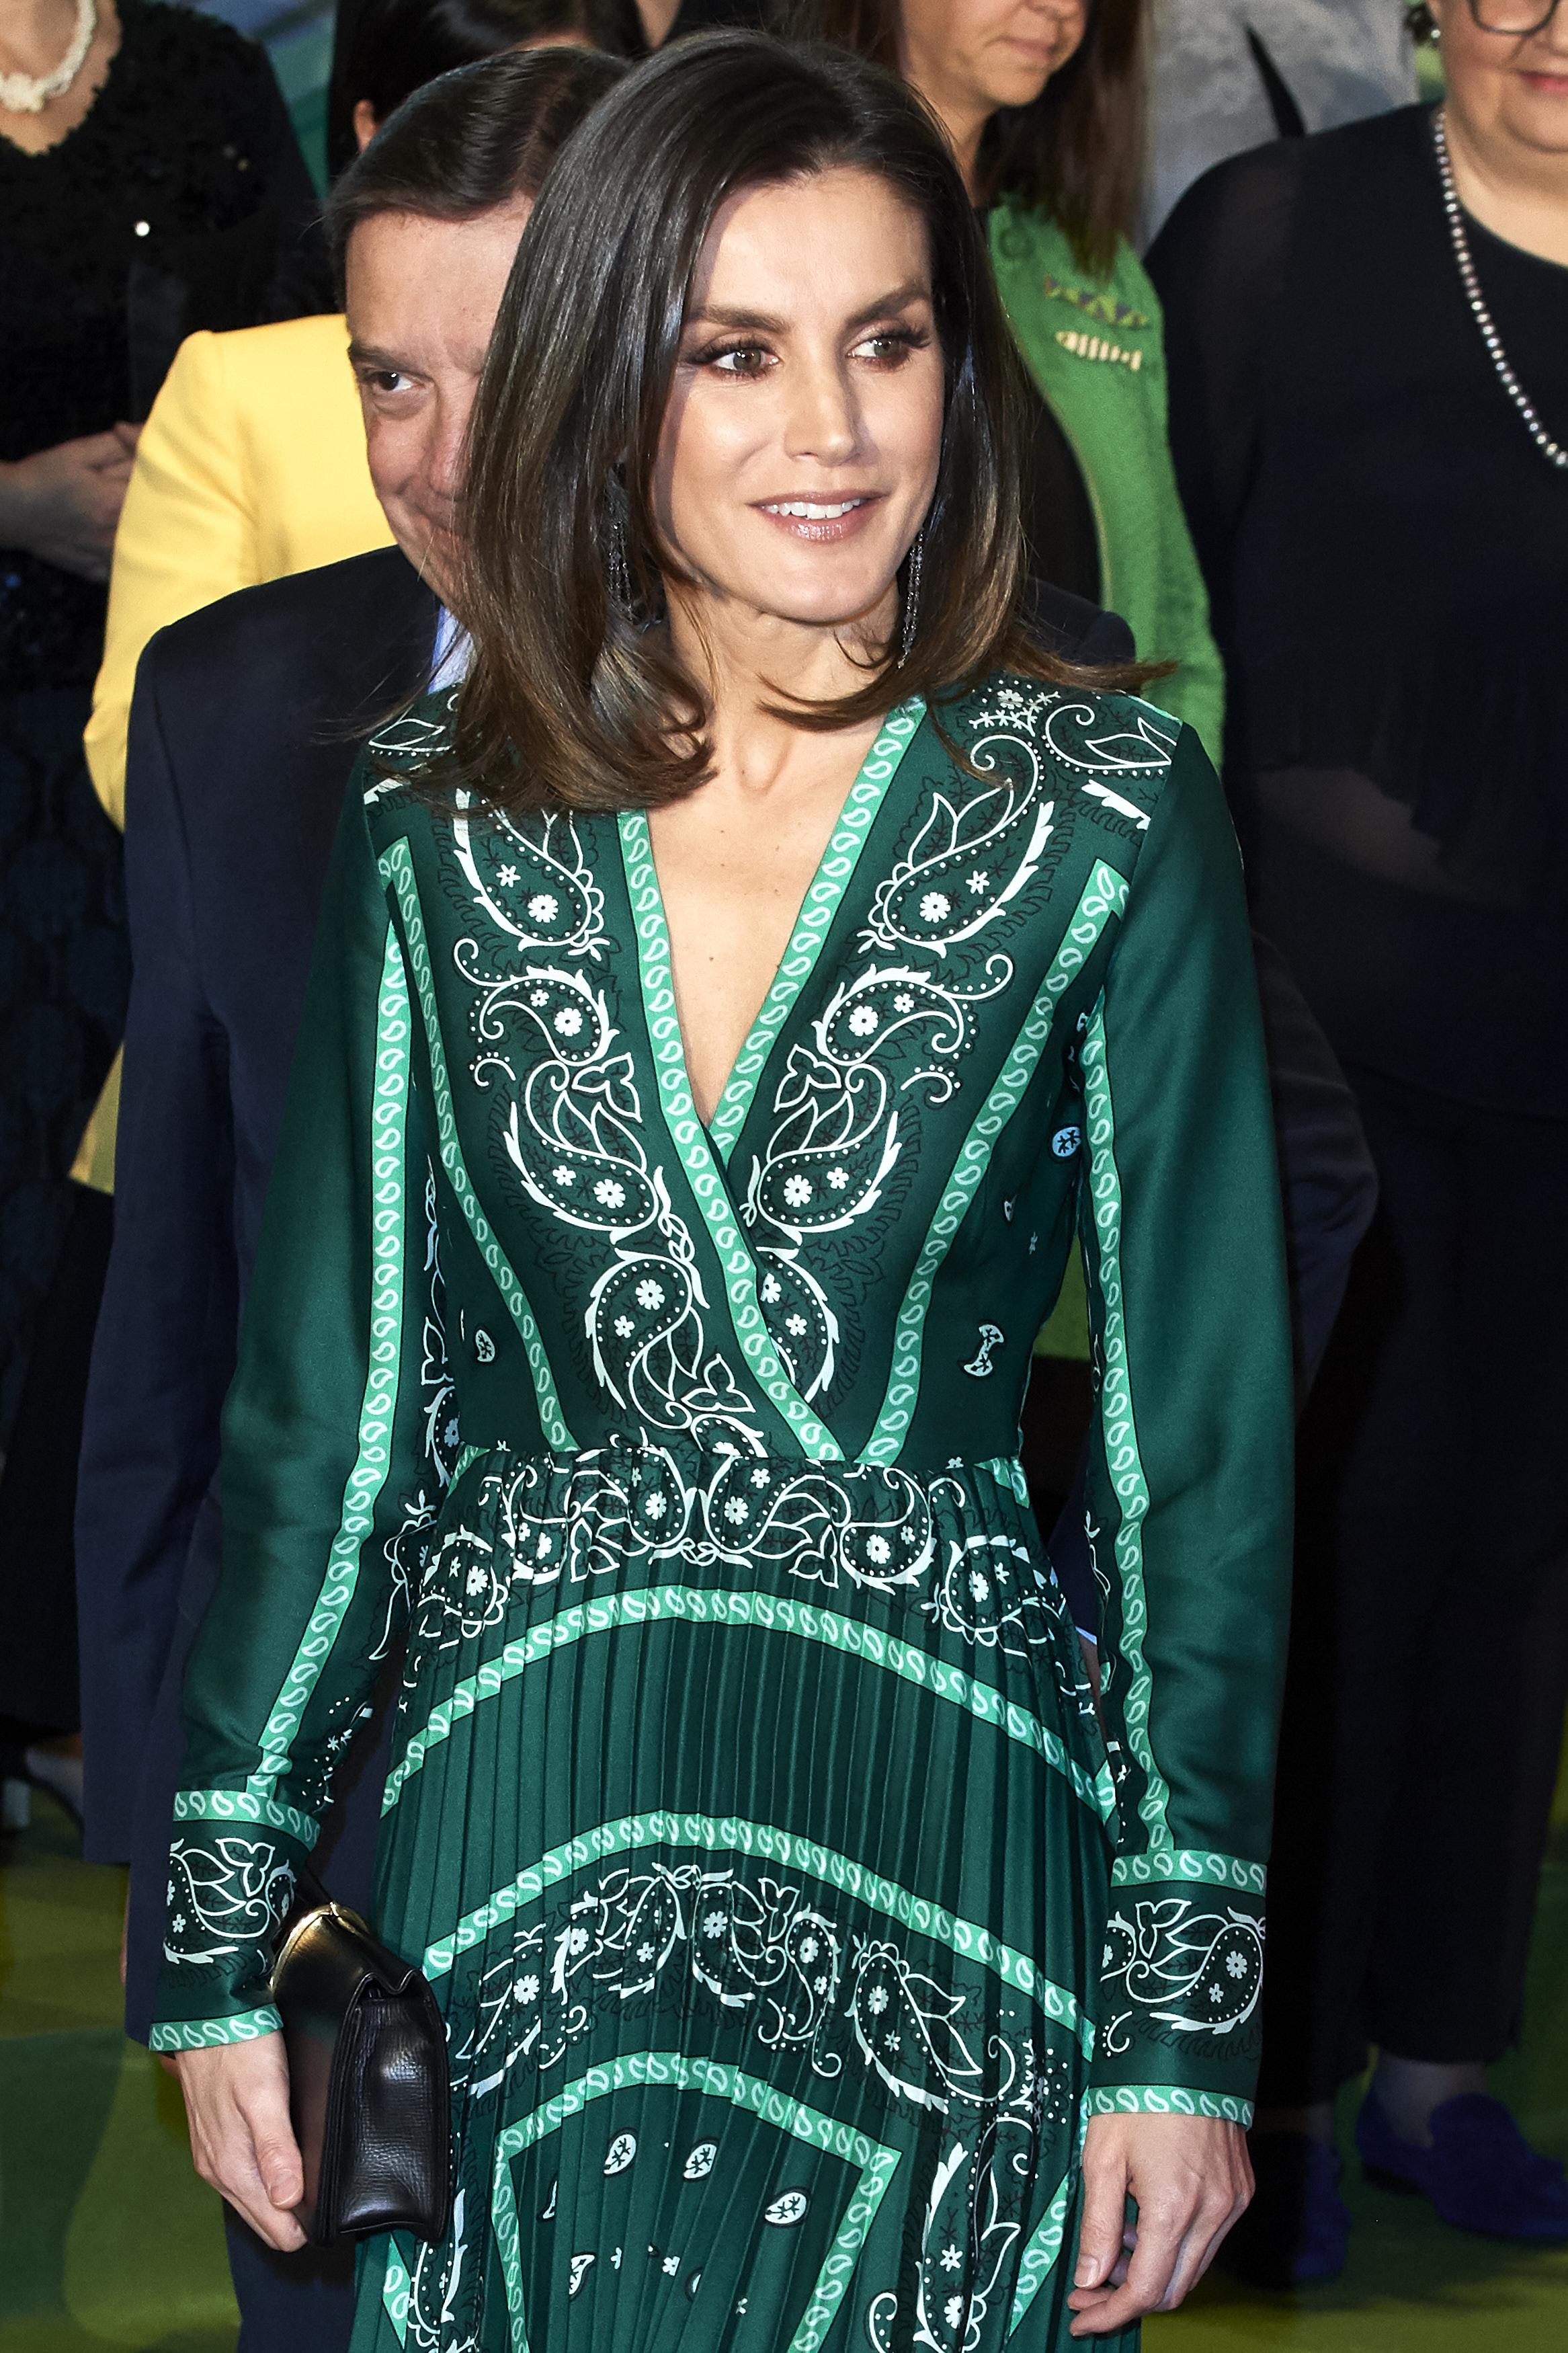 Queen Letizia Of Spain Attends The Closure Of AFAMMER International Congress